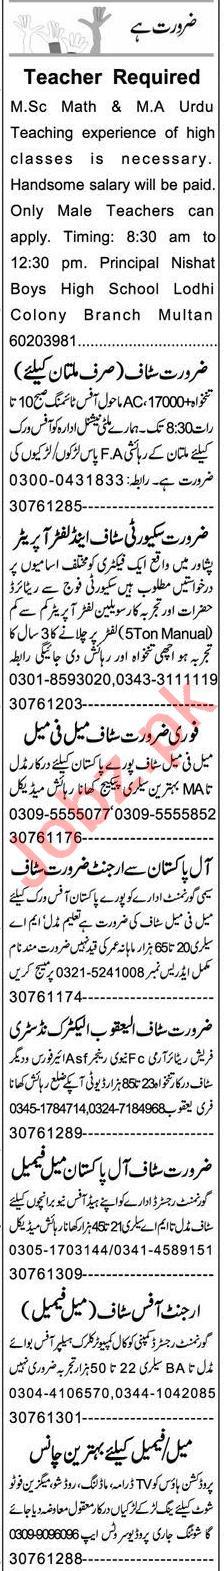 Express Sunday Multan Classified Ads 7th Feb 2021